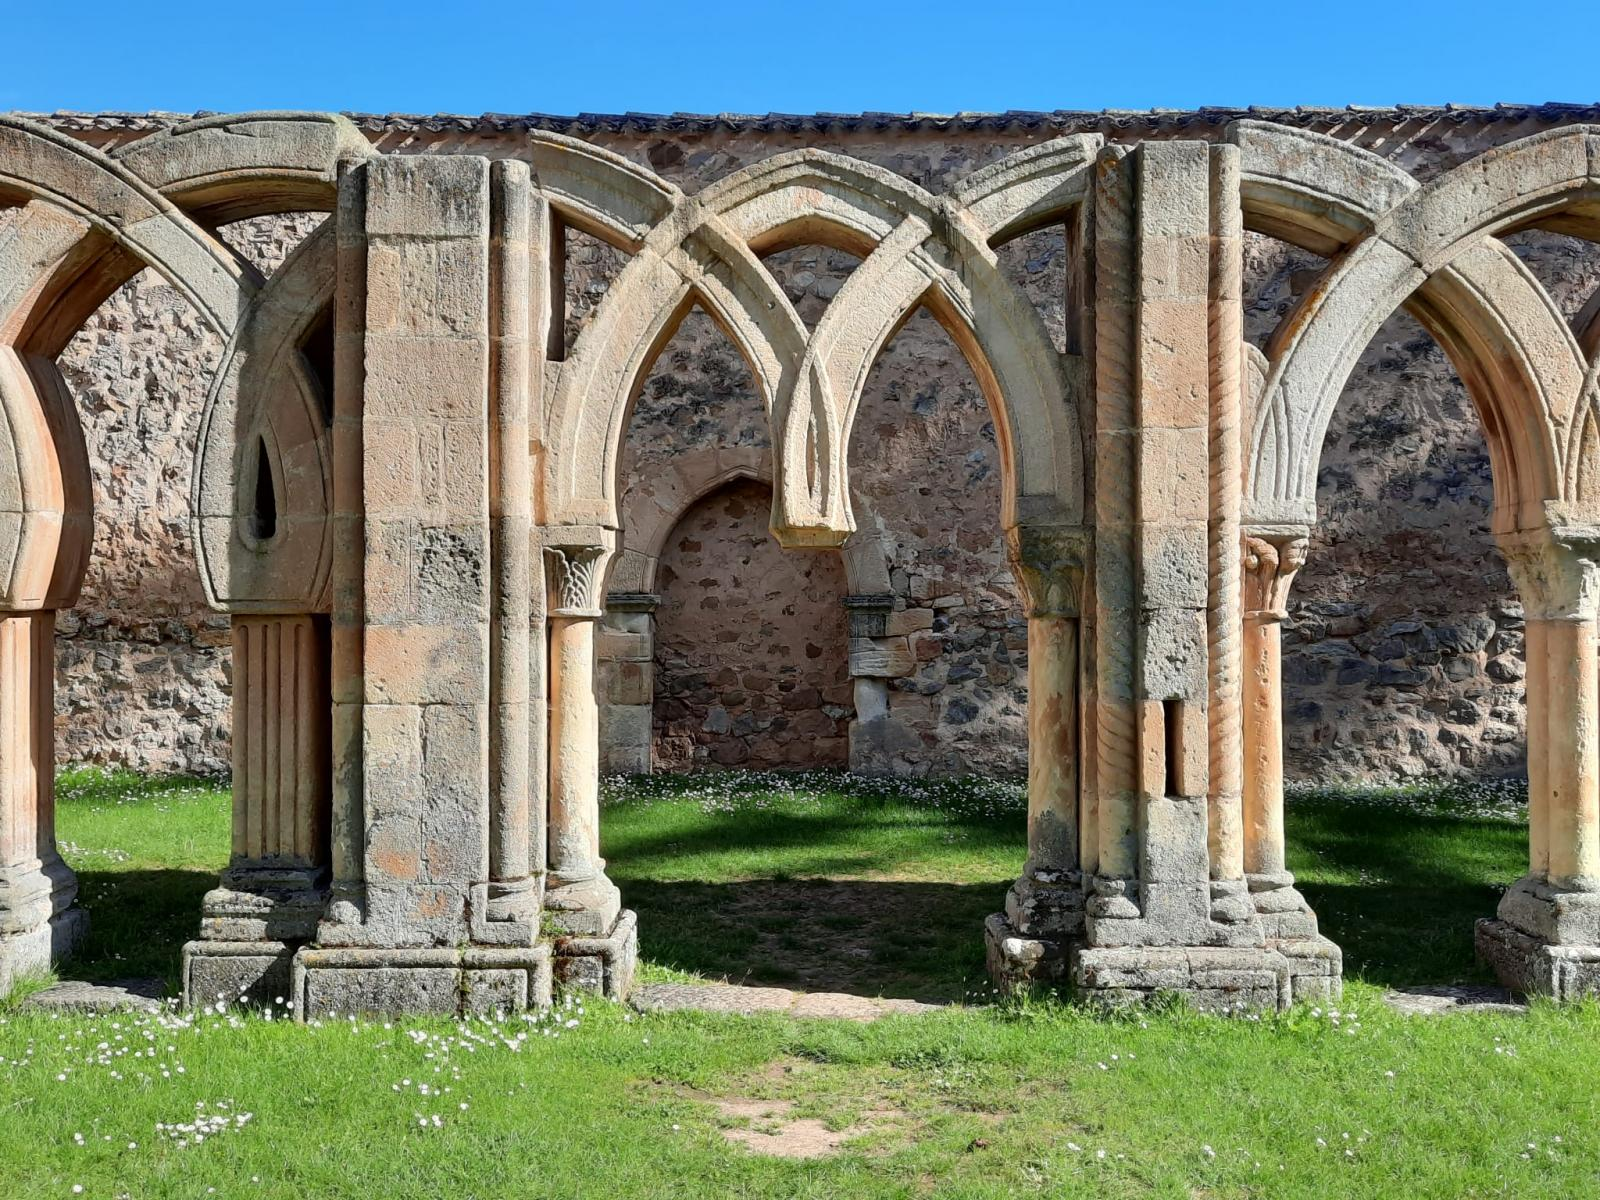 Visita Guiada-Claustros románicos de Soria